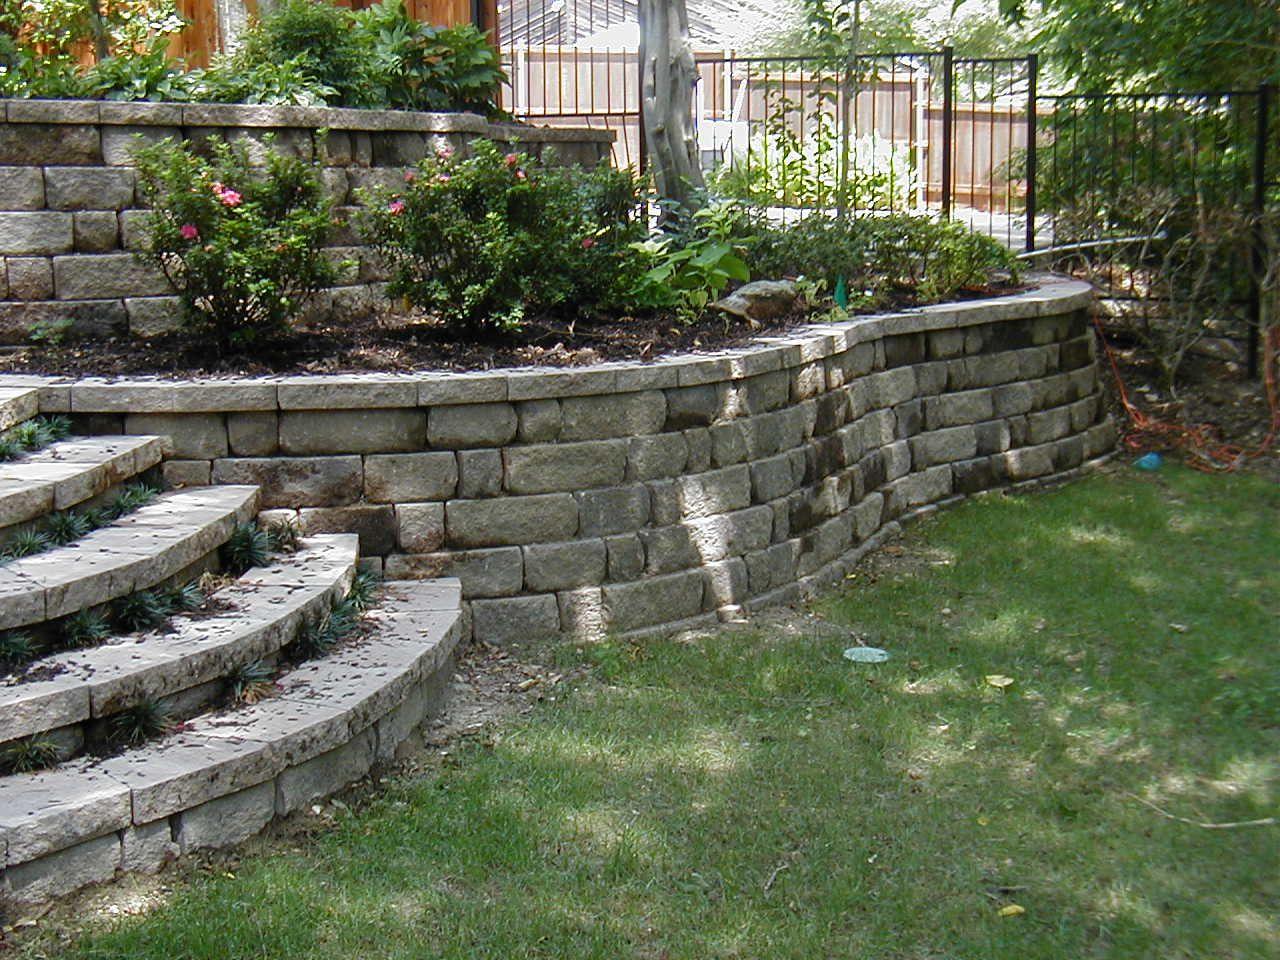 retaining walls | escalier | pinterest | retaining walls, walls and